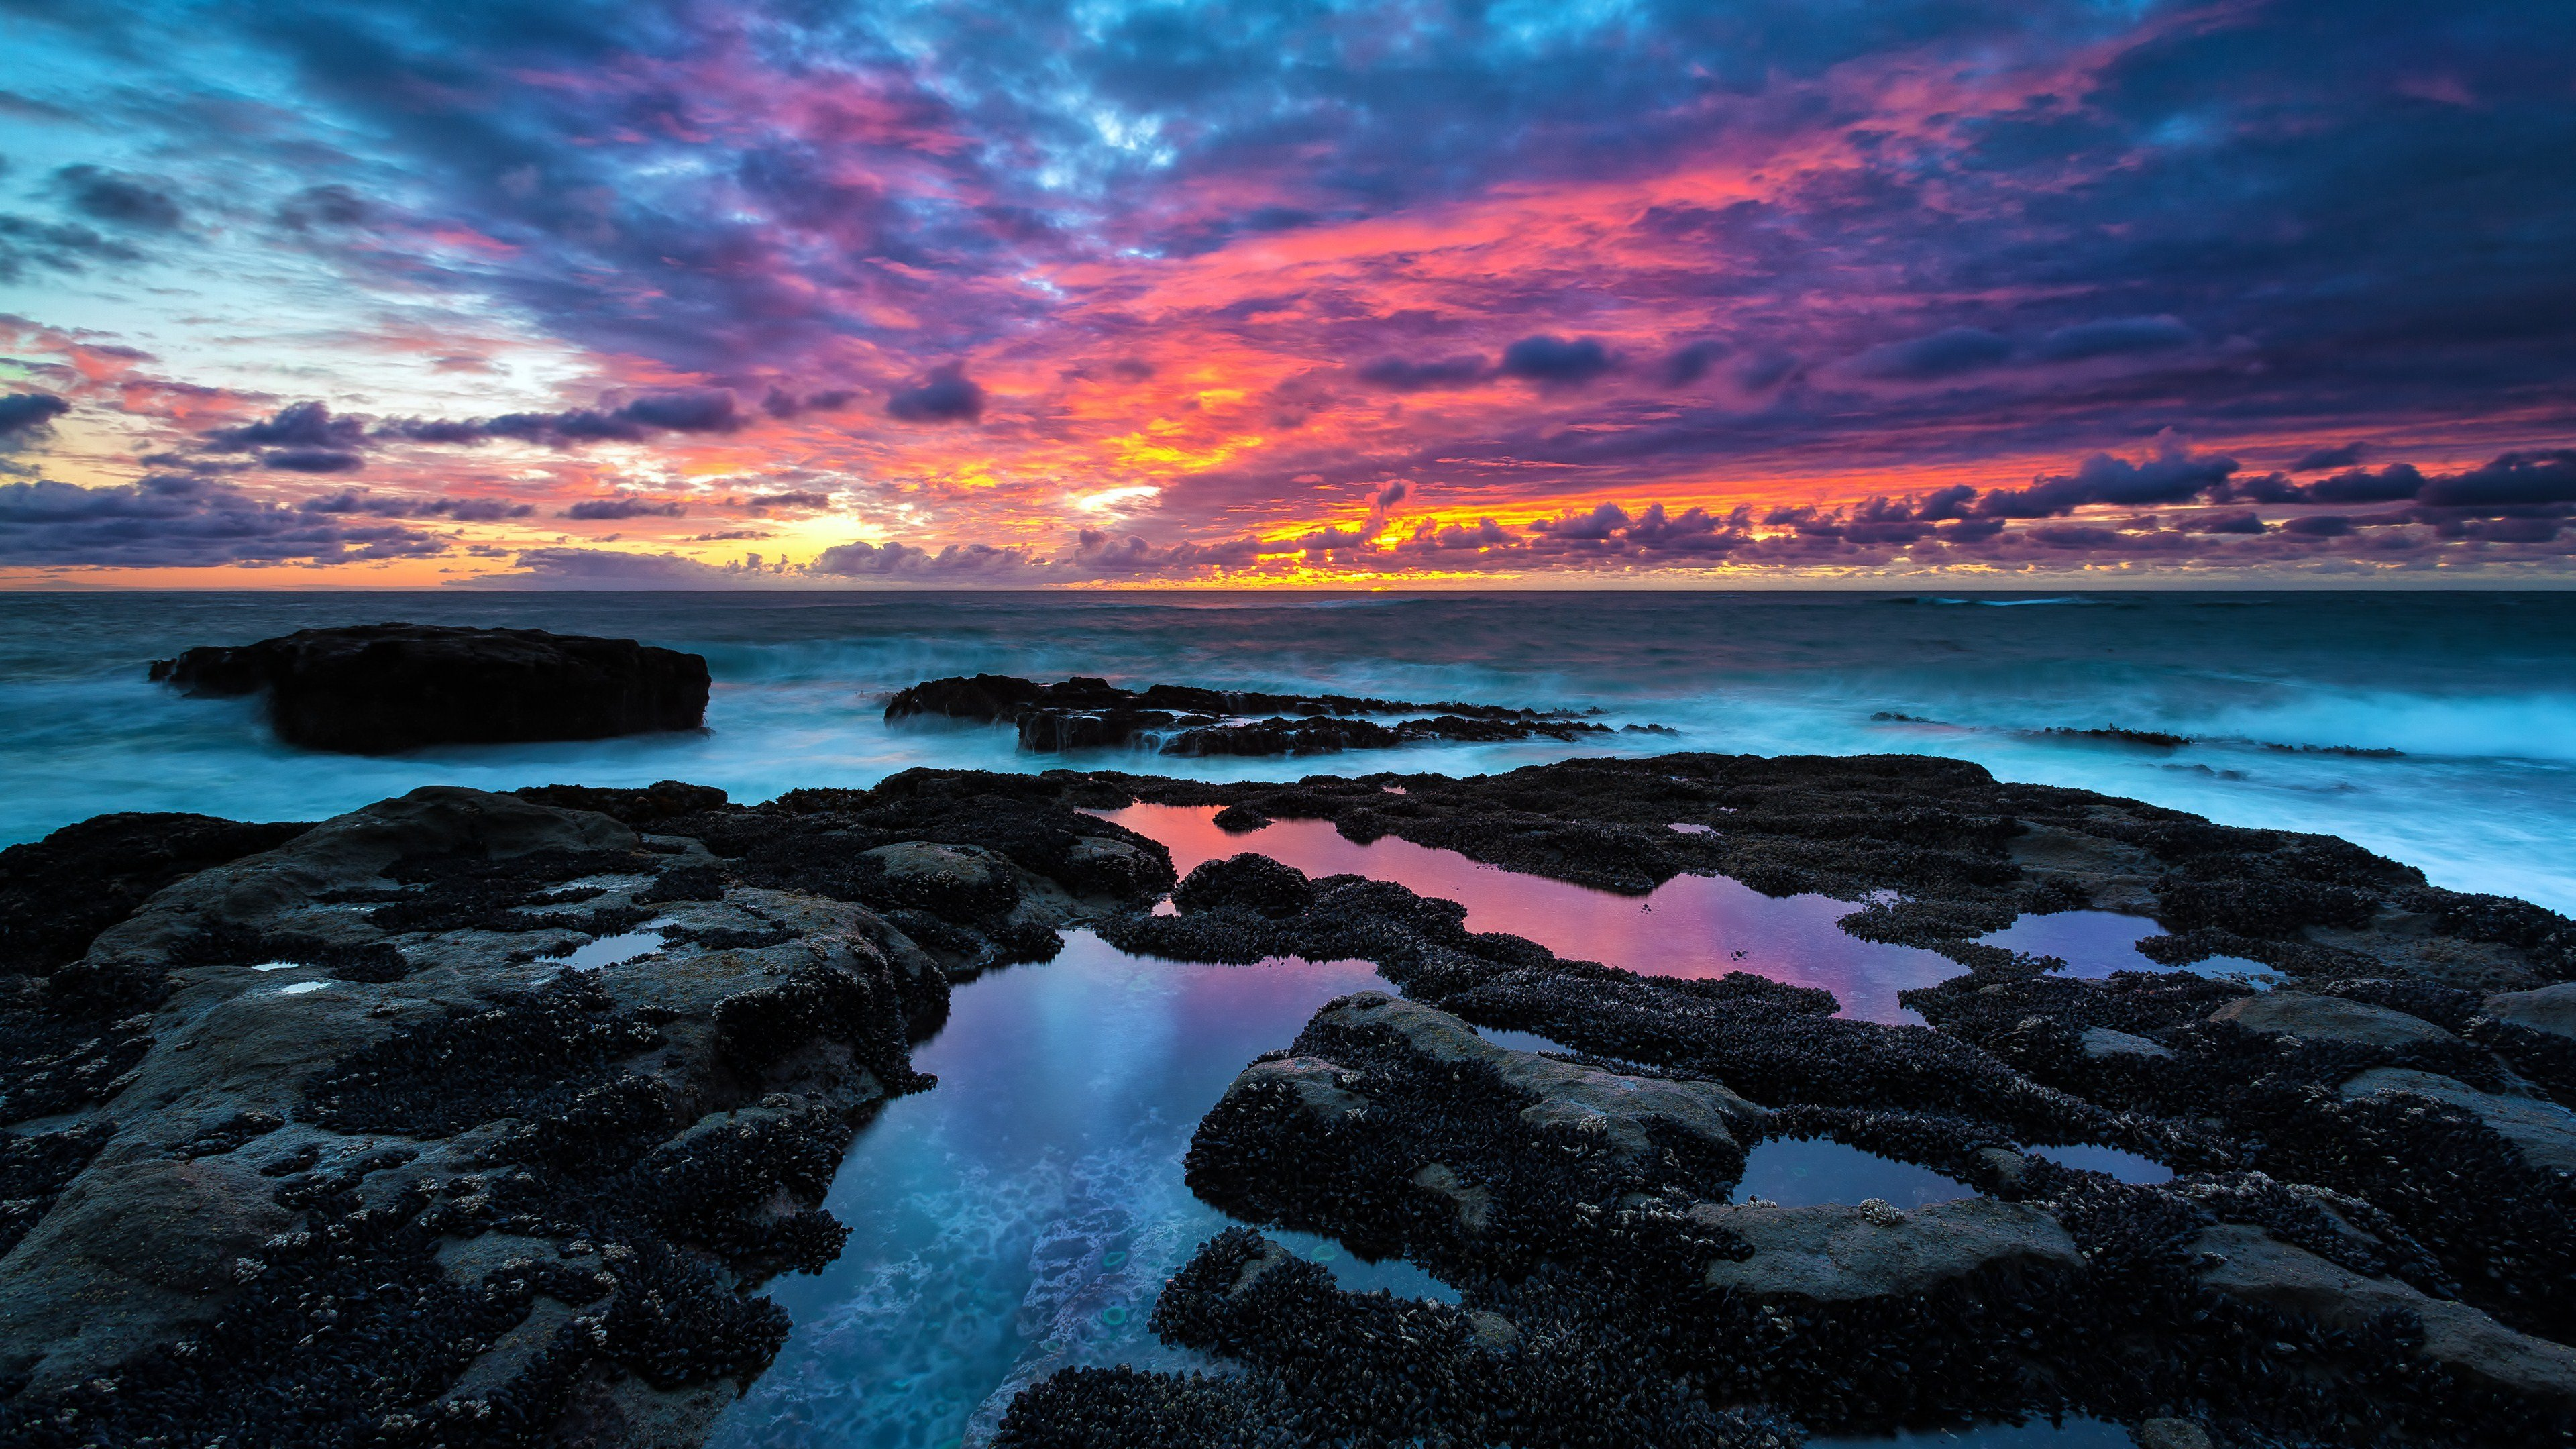 4k Sunset 272 Ultra HD Wallpapers Wide Screen Wallpaper 1080p2K4K 3840x2160